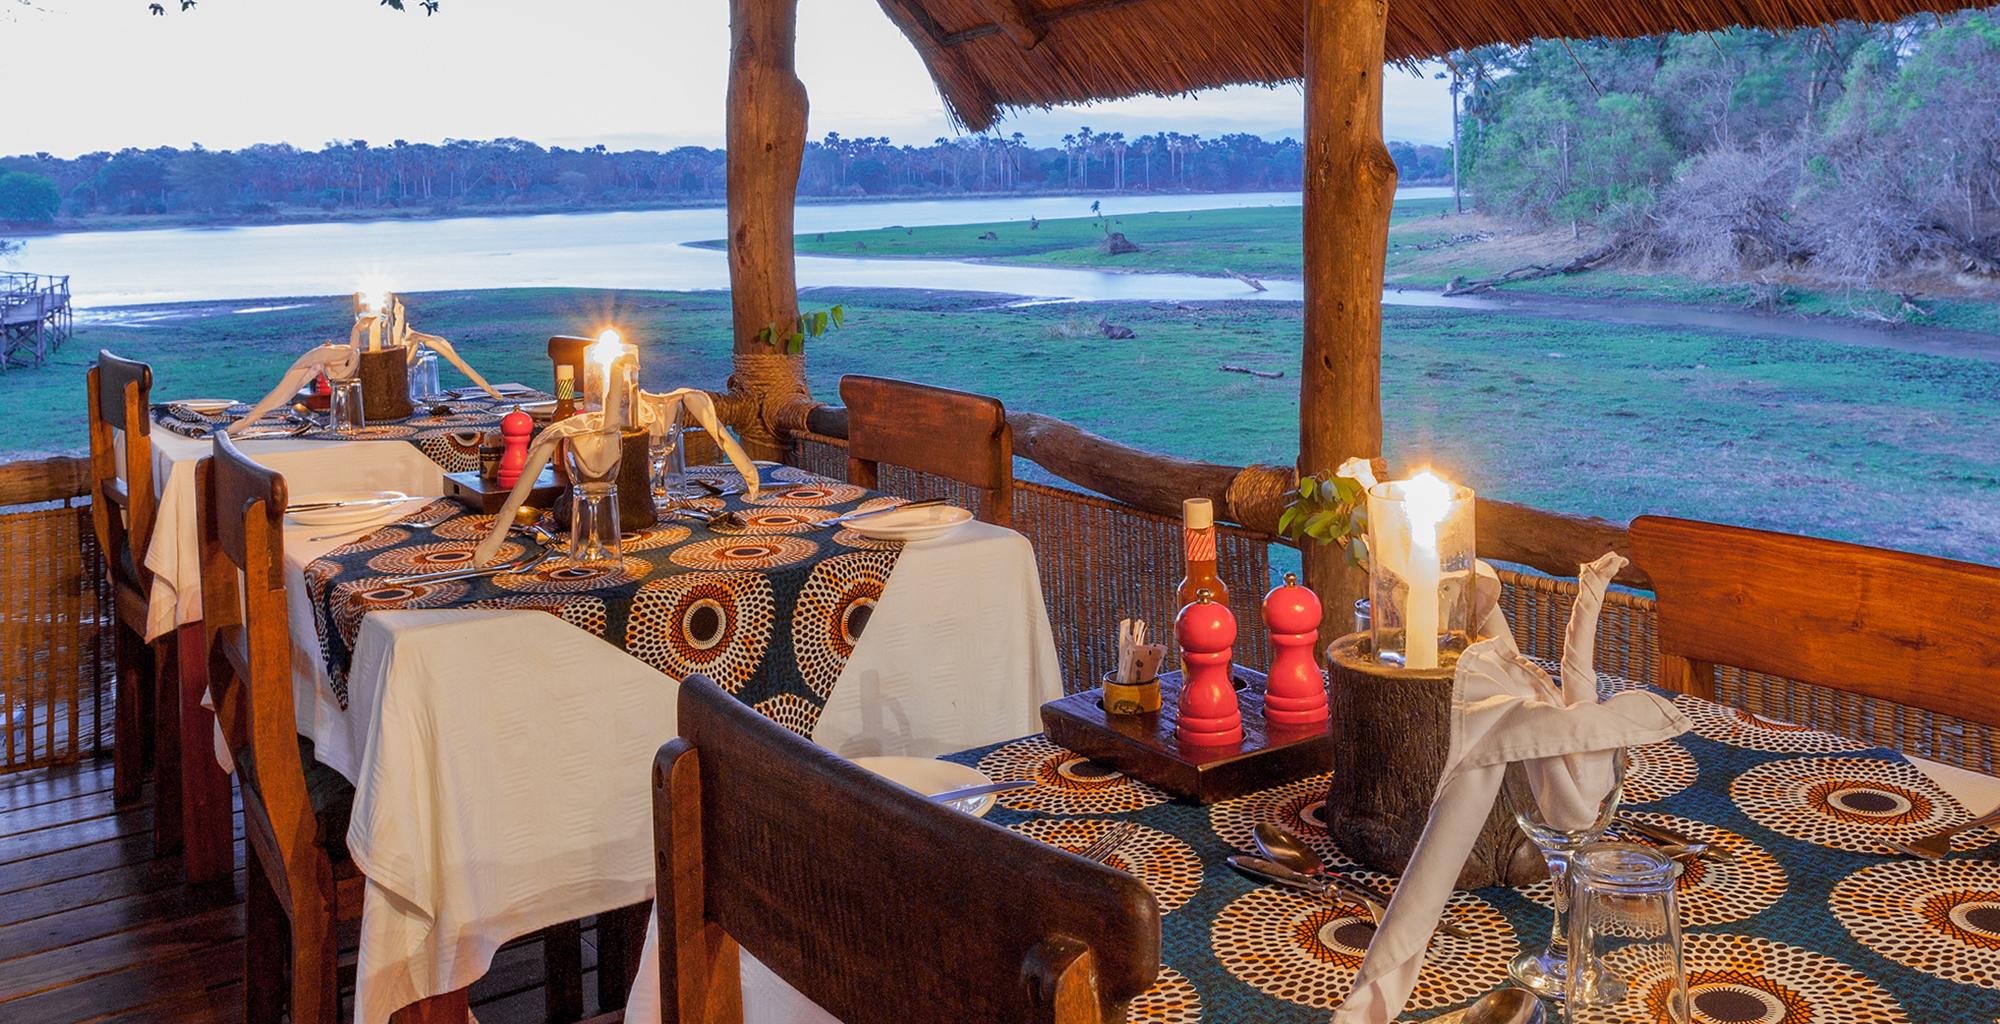 Malawi-Liwonde-National-Park-Mvuu-Lodge-Dining